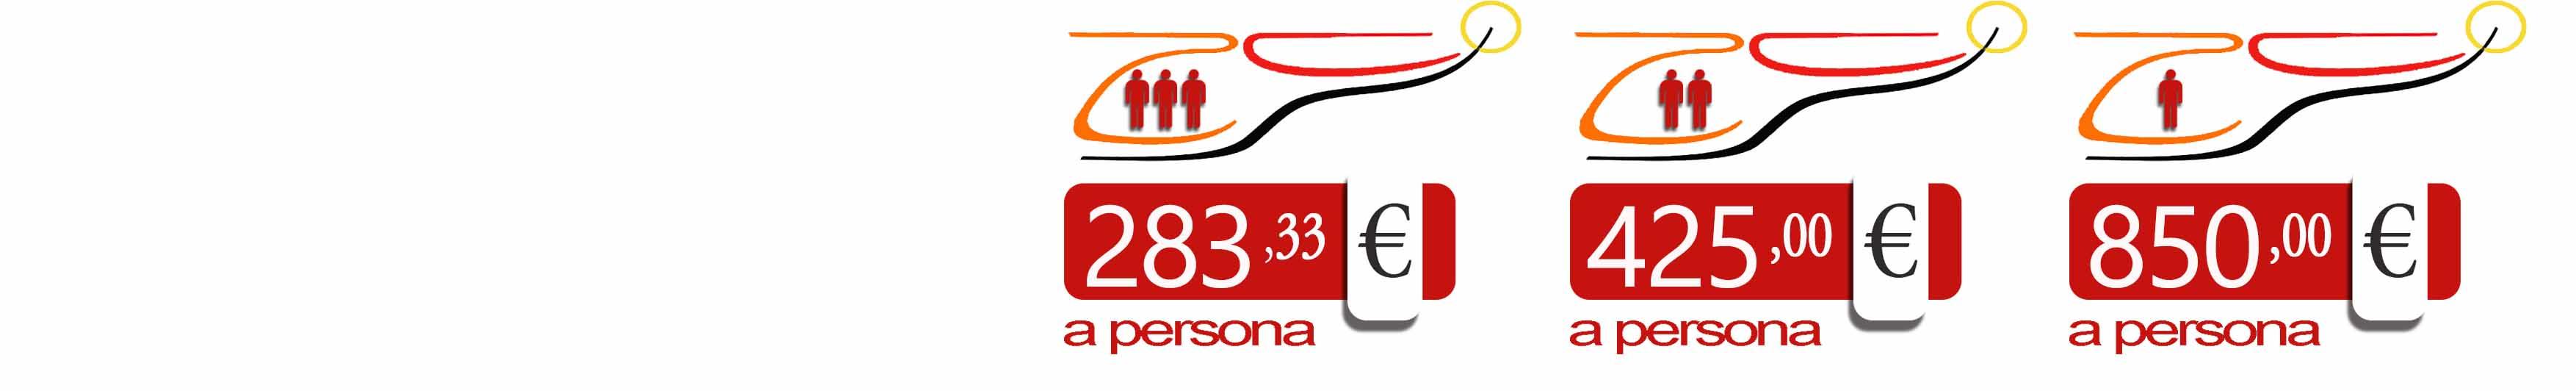 listino volitalia_€ 283